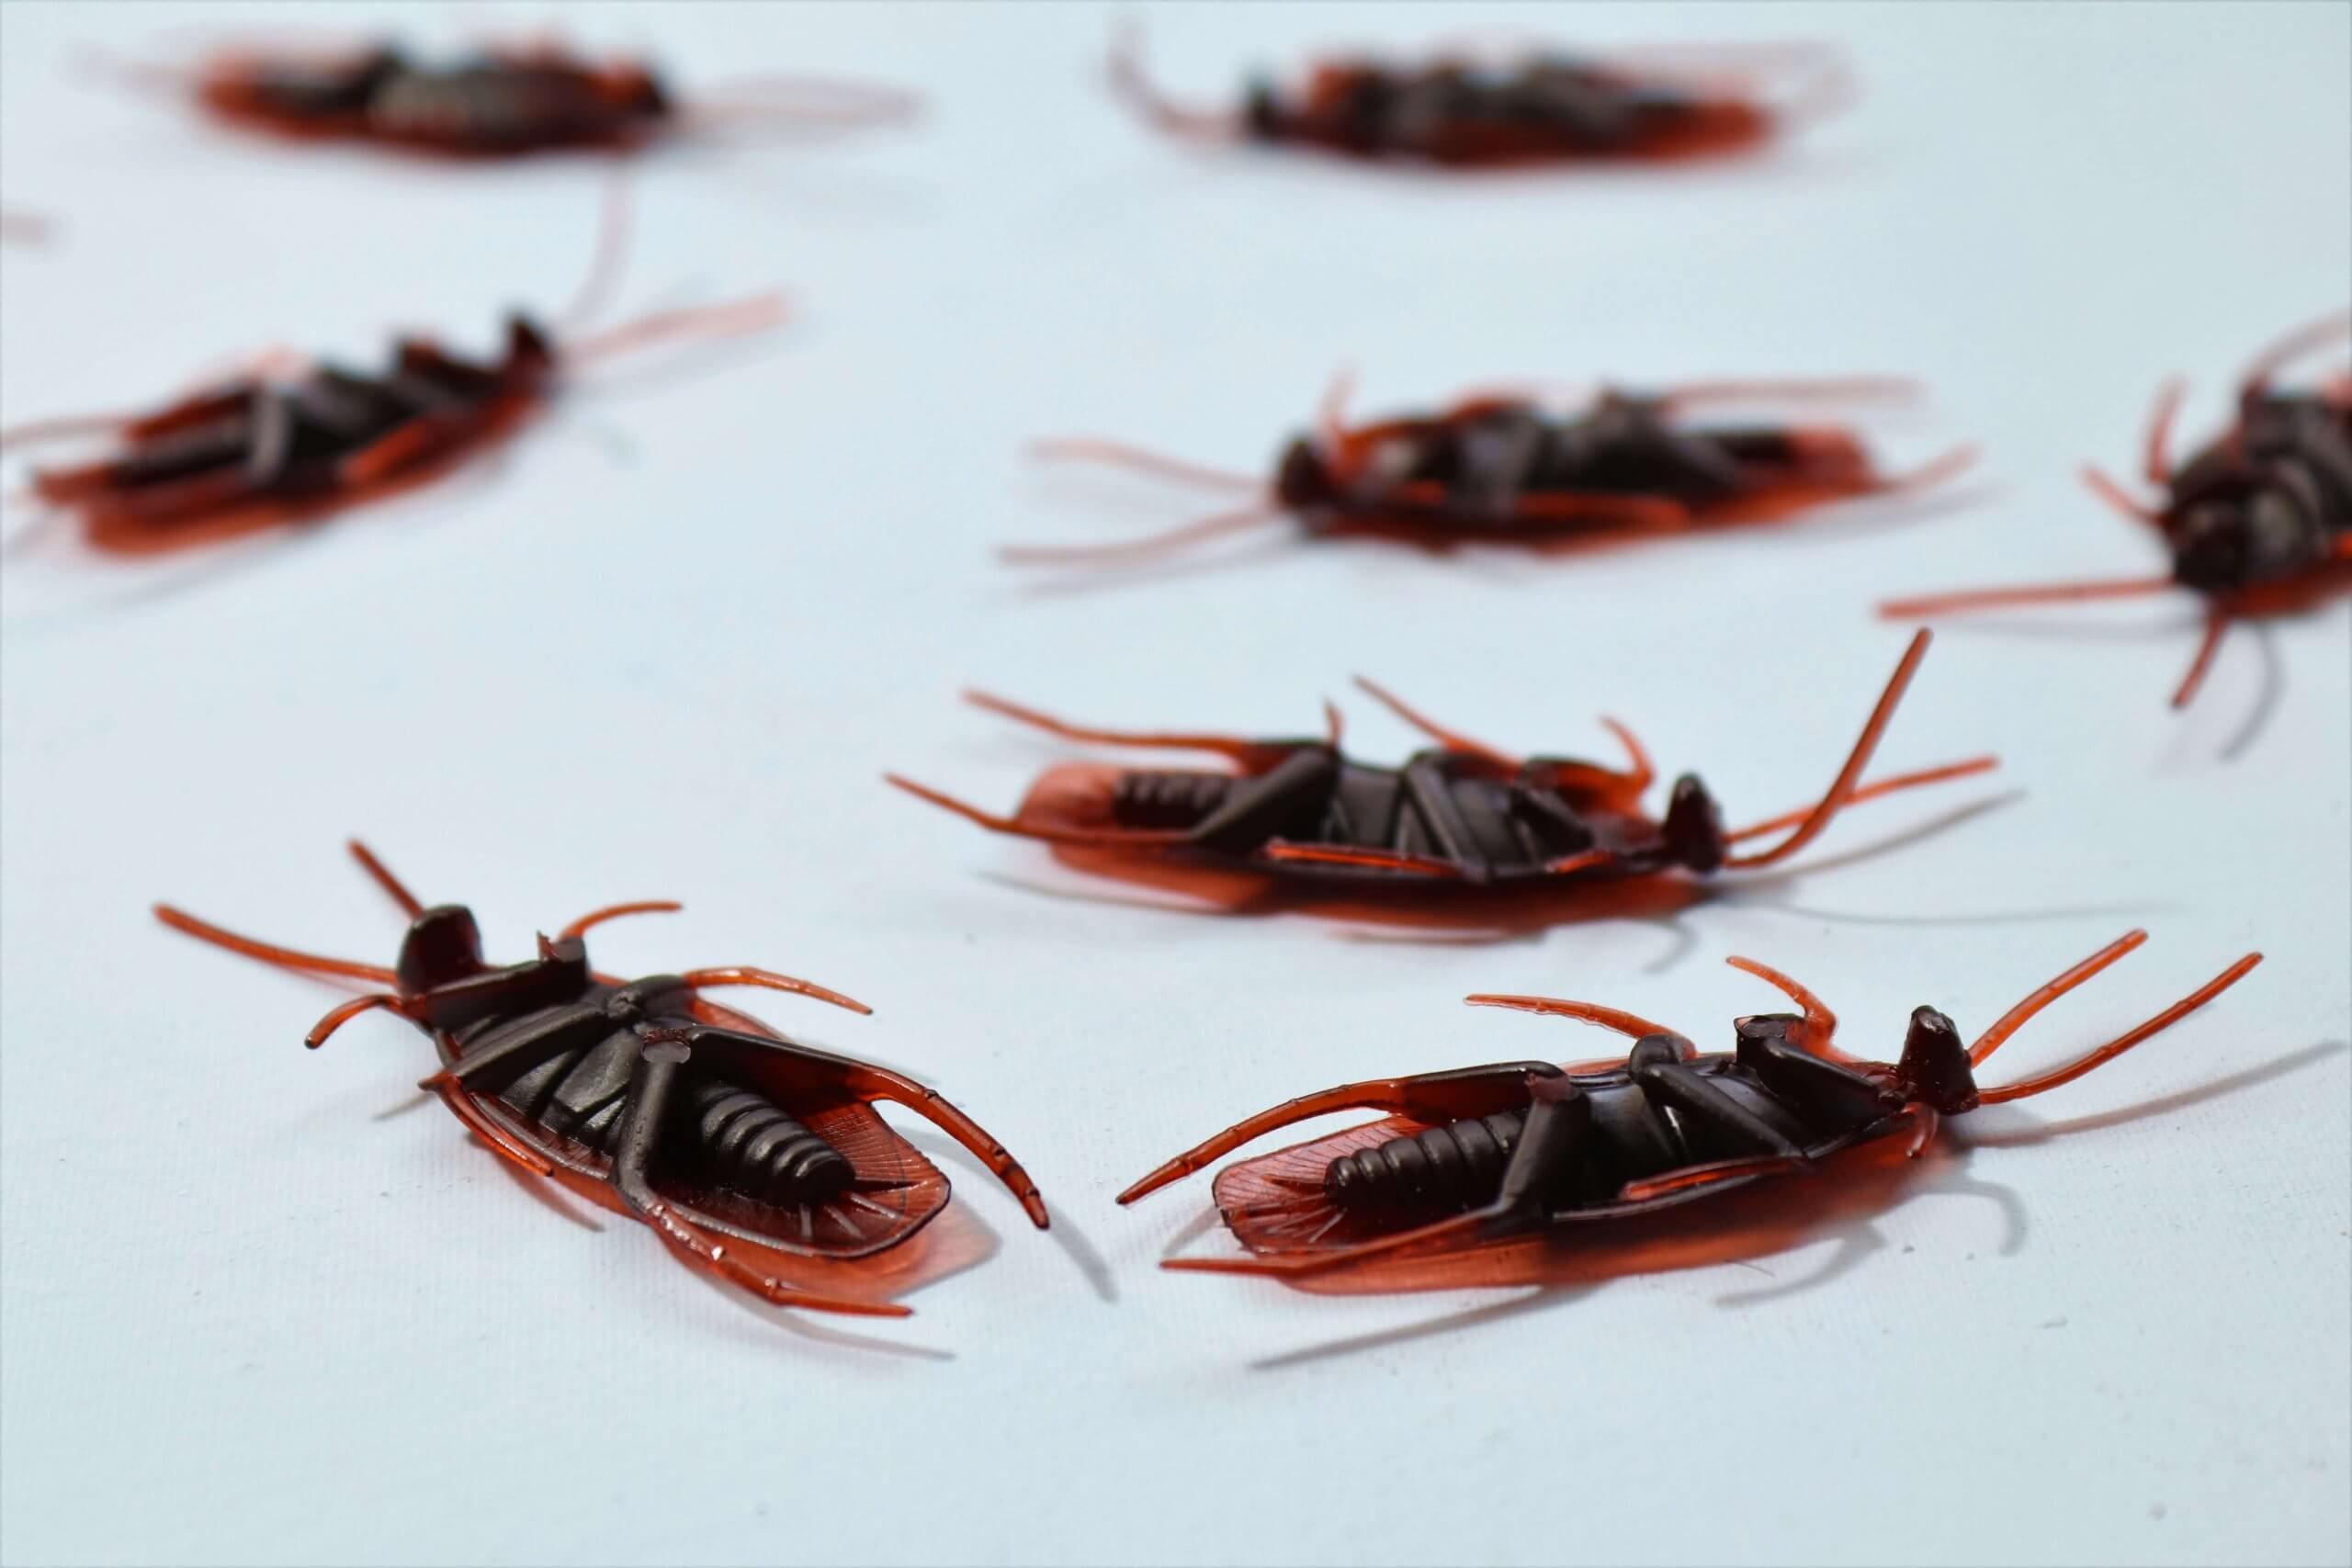 Protek-America-tips-for-winter-pest-control